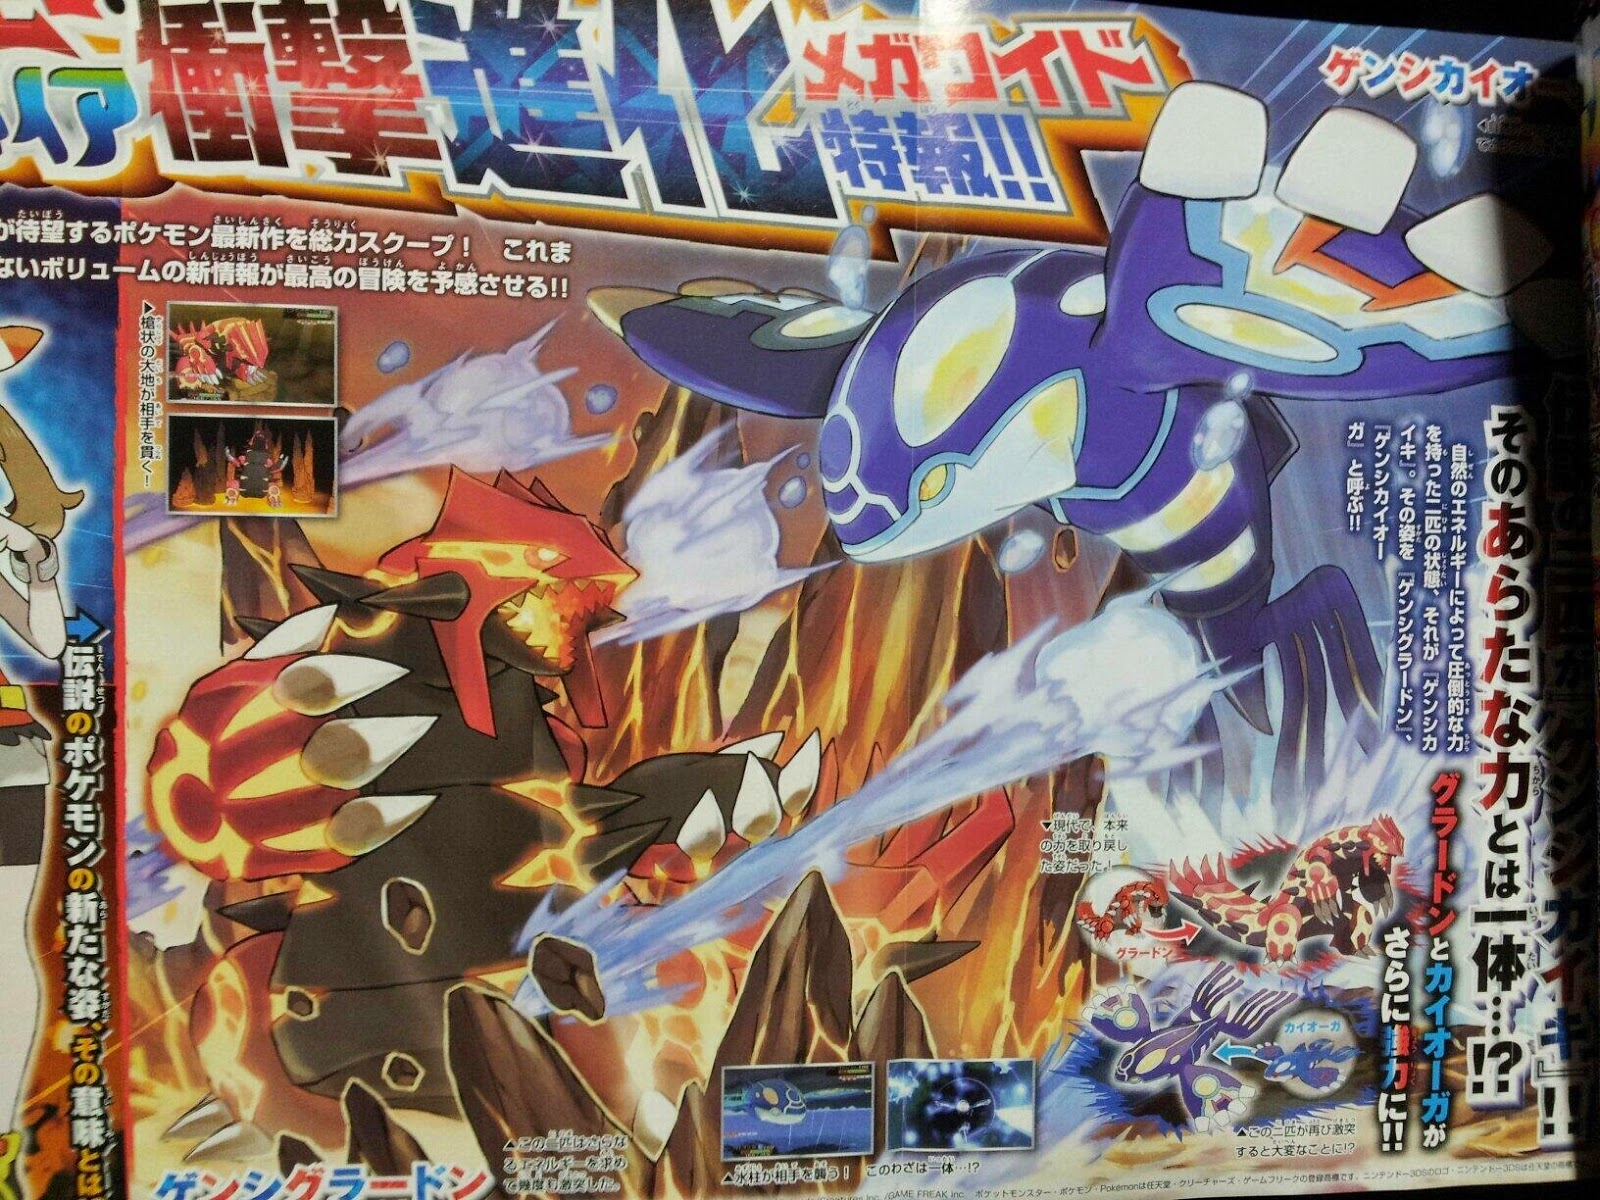 [GAMES] Pokémon Omega Ruby/Alpha Sapphire - Novo Pokémon! Corocoro7142